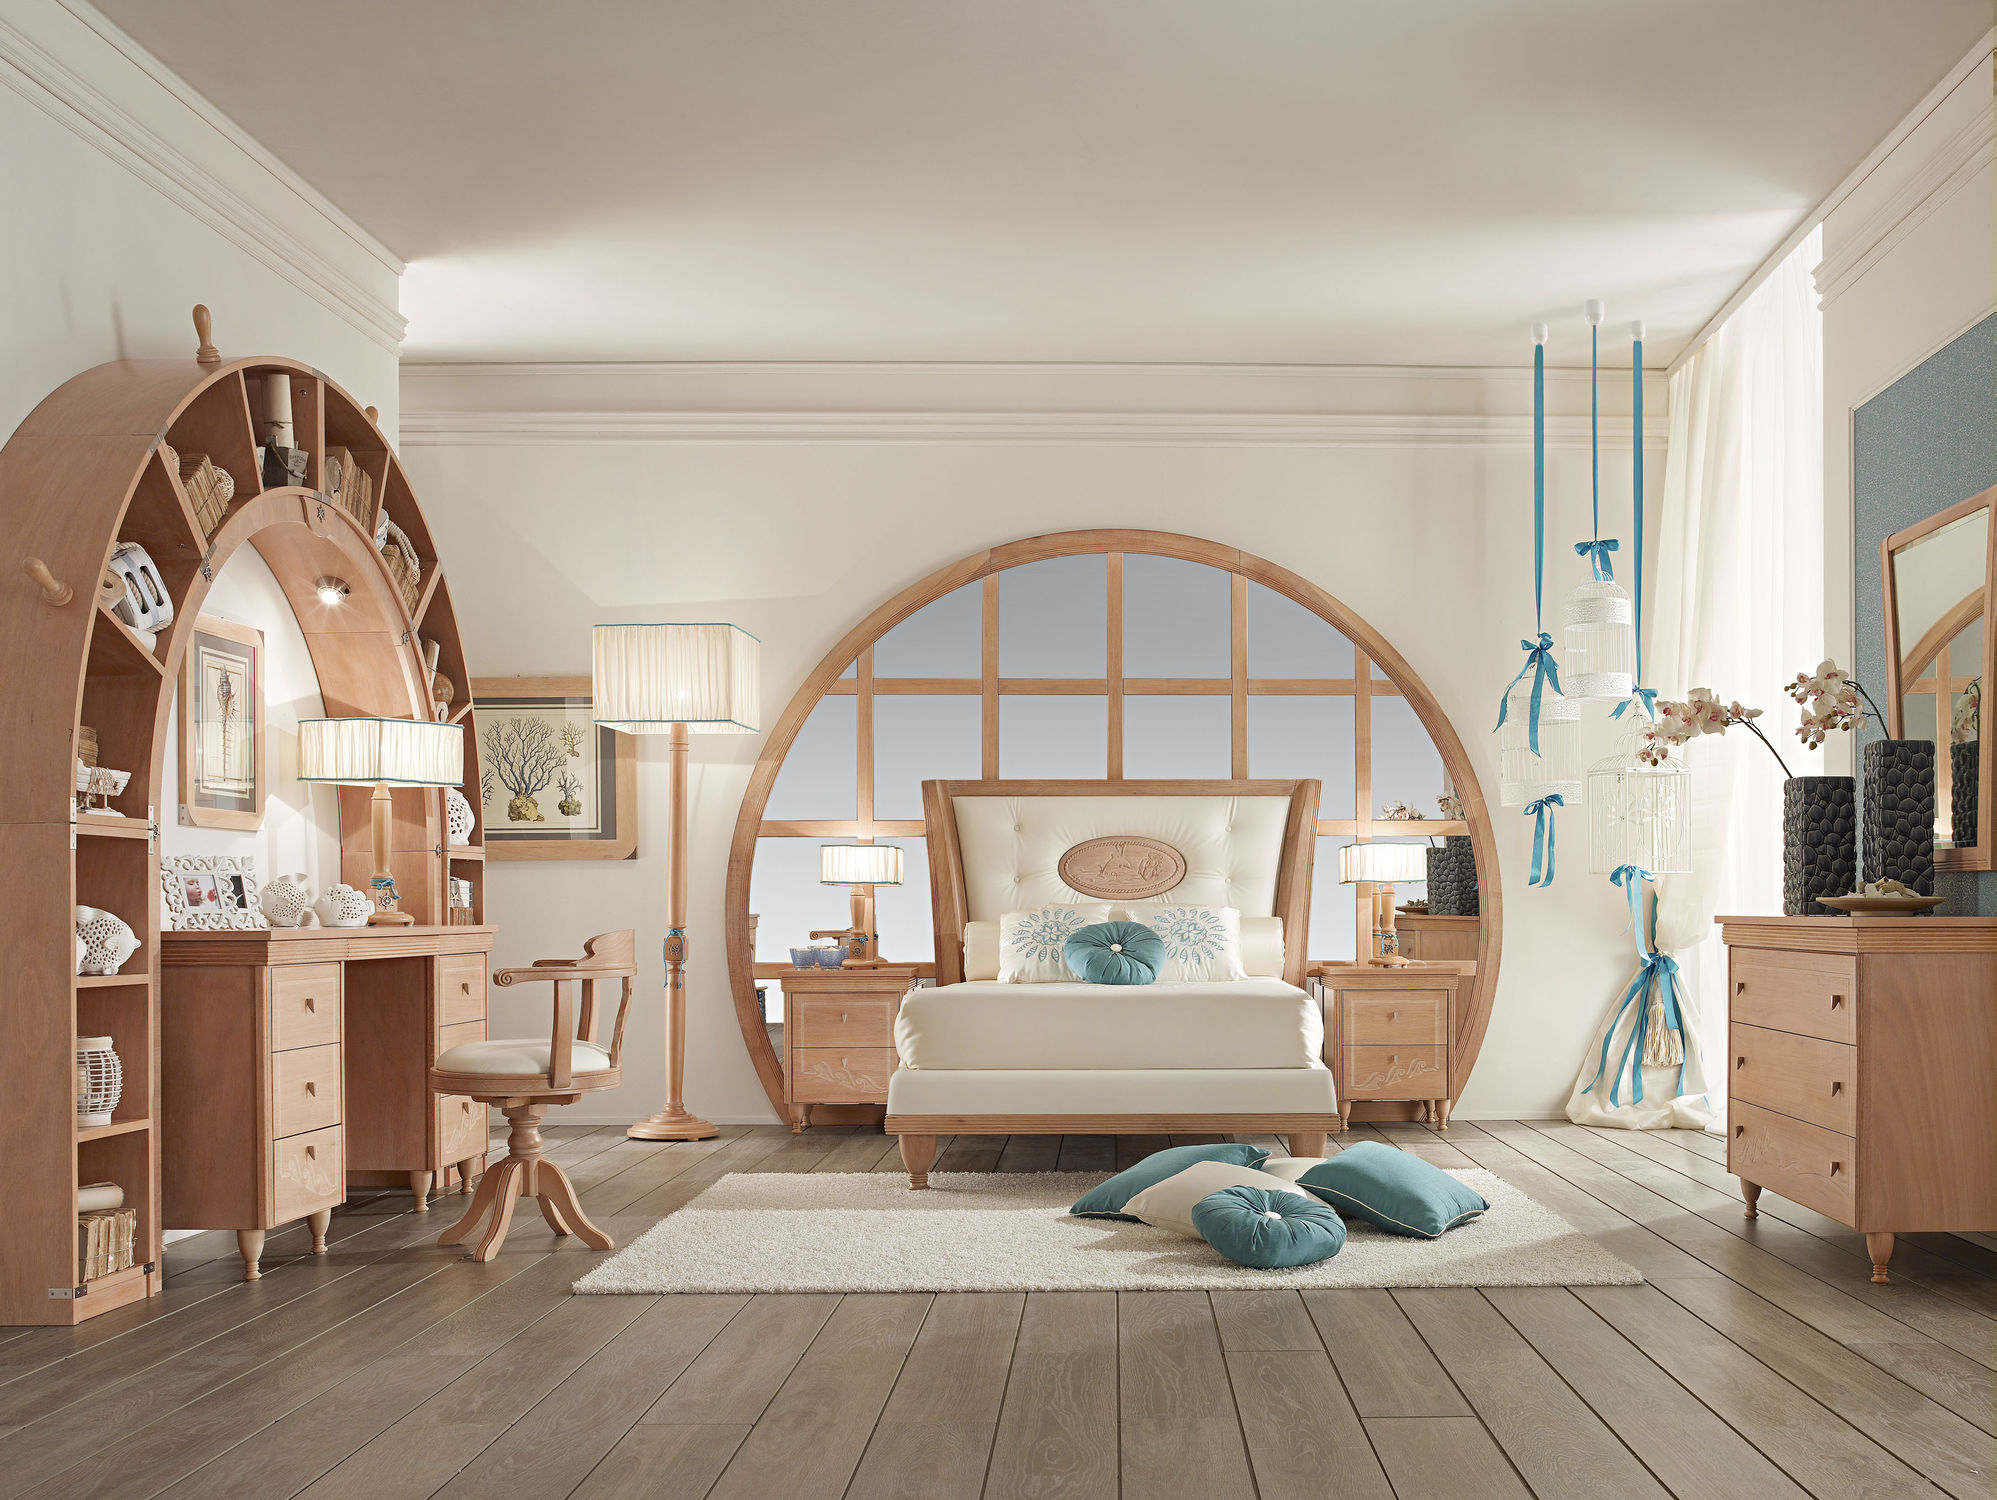 Kinderzimmer holz  Kinderzimmer für Mädchen / Holz - 849 - Caroti